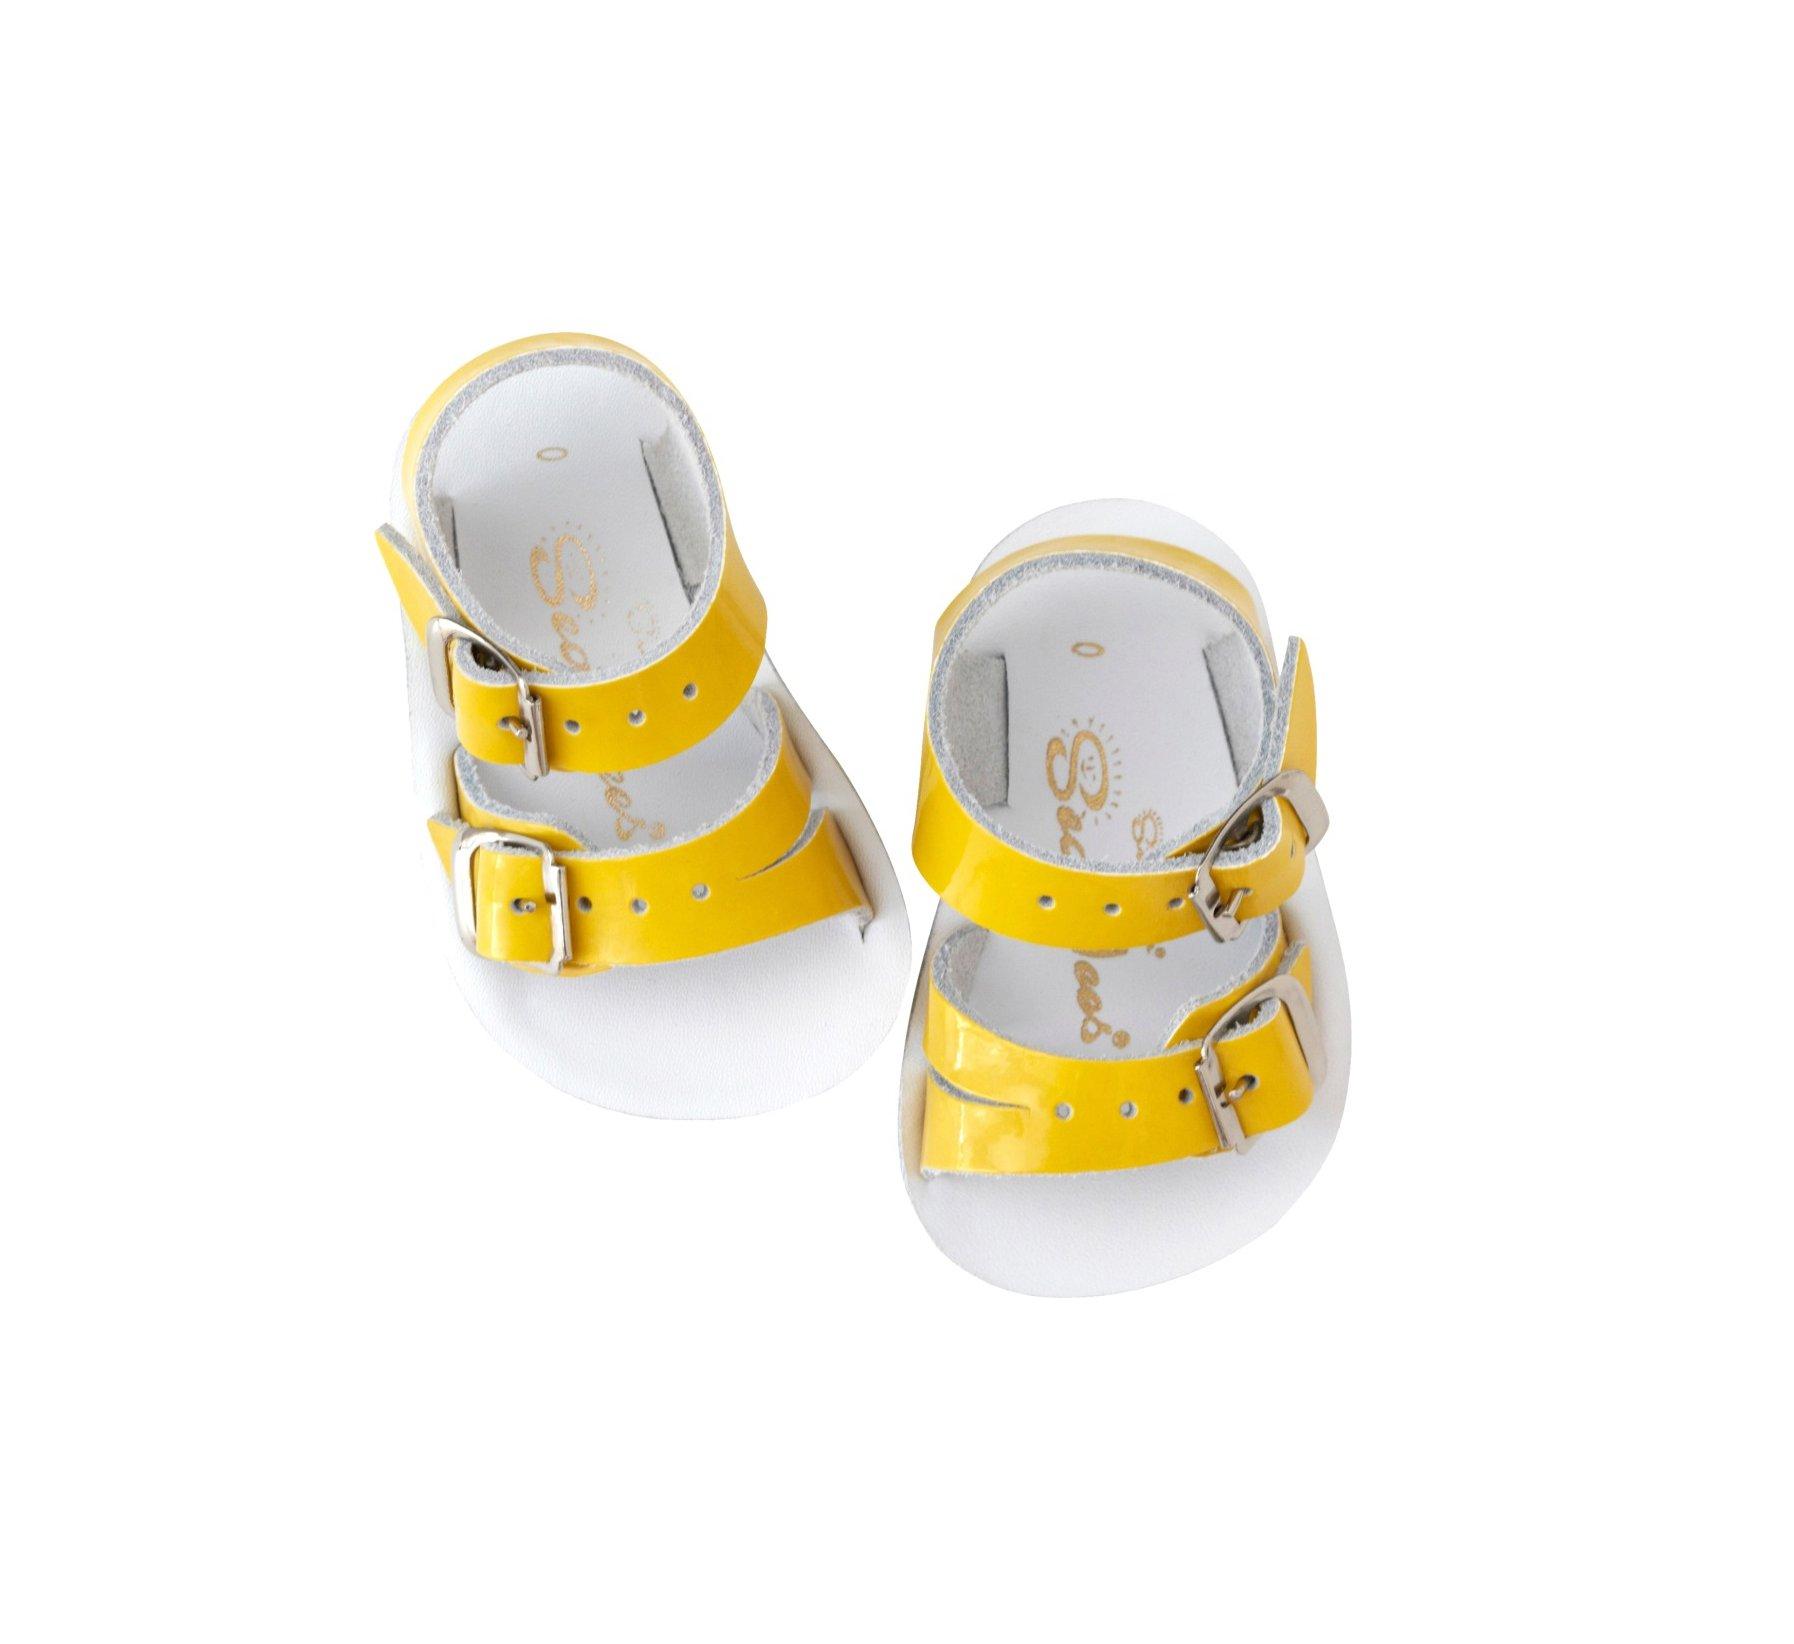 Seawee Shiny Yellow - Salt Water Sandals